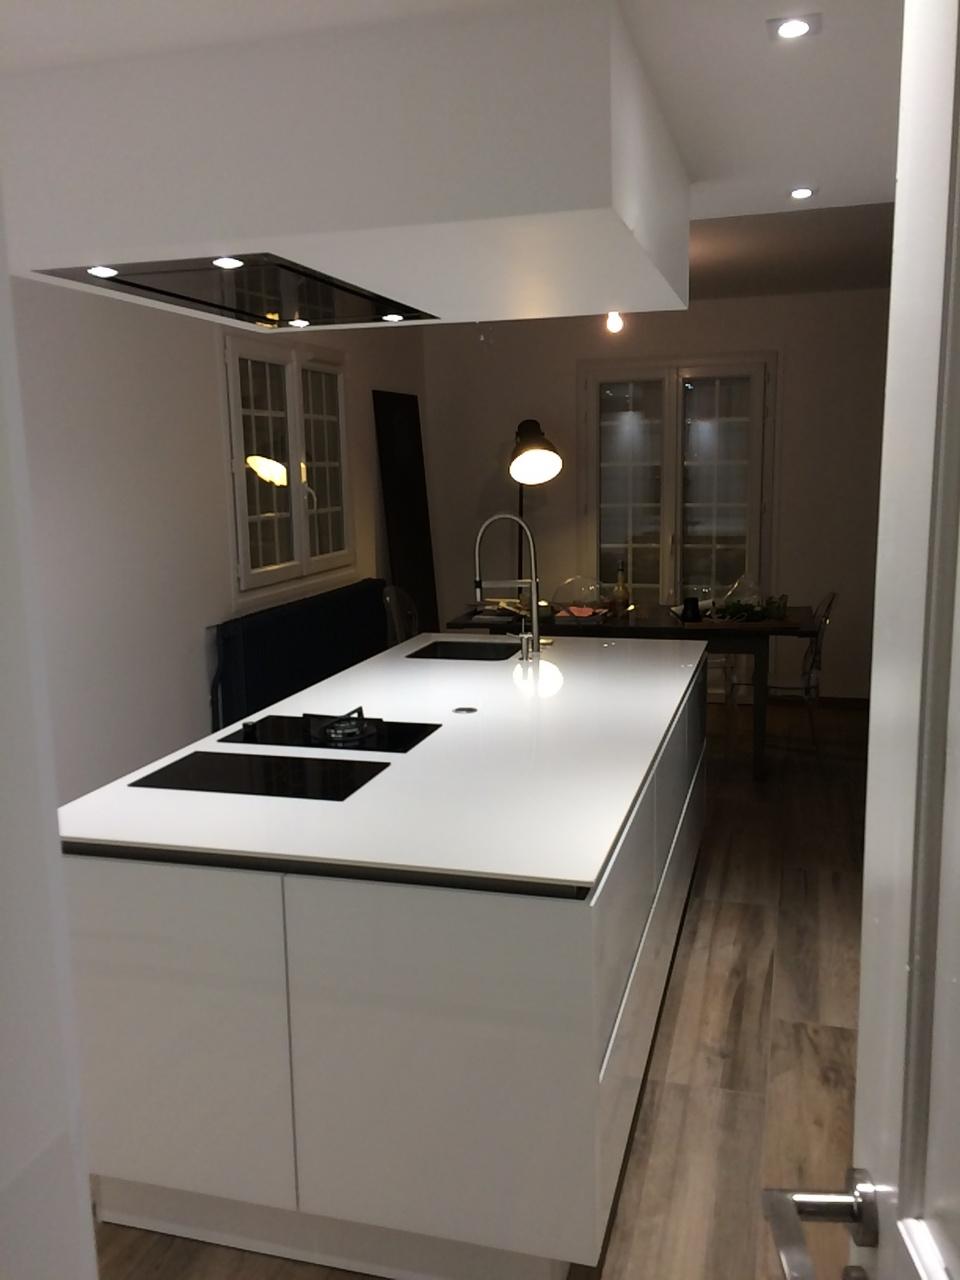 cuisiniste caen finest with cuisiniste caen interesting notre mtier de cuisiniste caen la. Black Bedroom Furniture Sets. Home Design Ideas